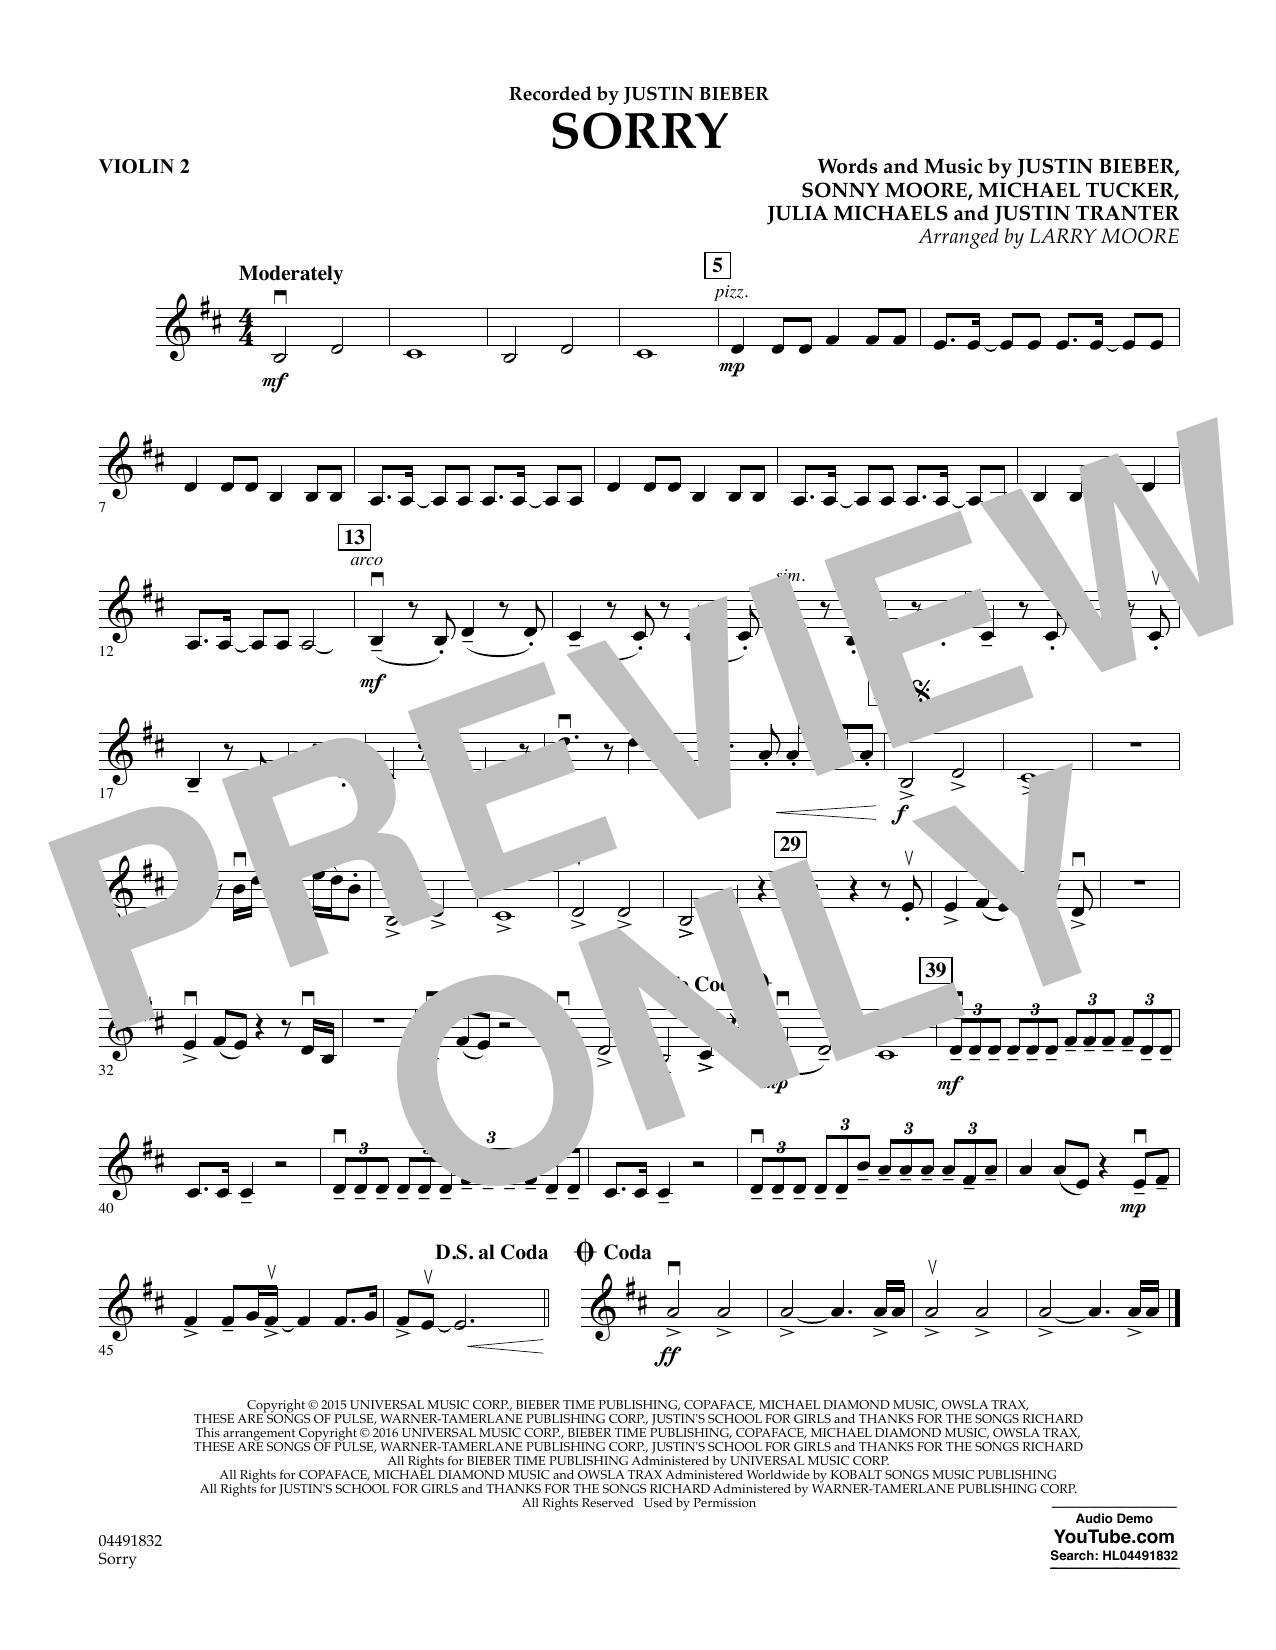 Justin Bieber - Sorry - Violin 2